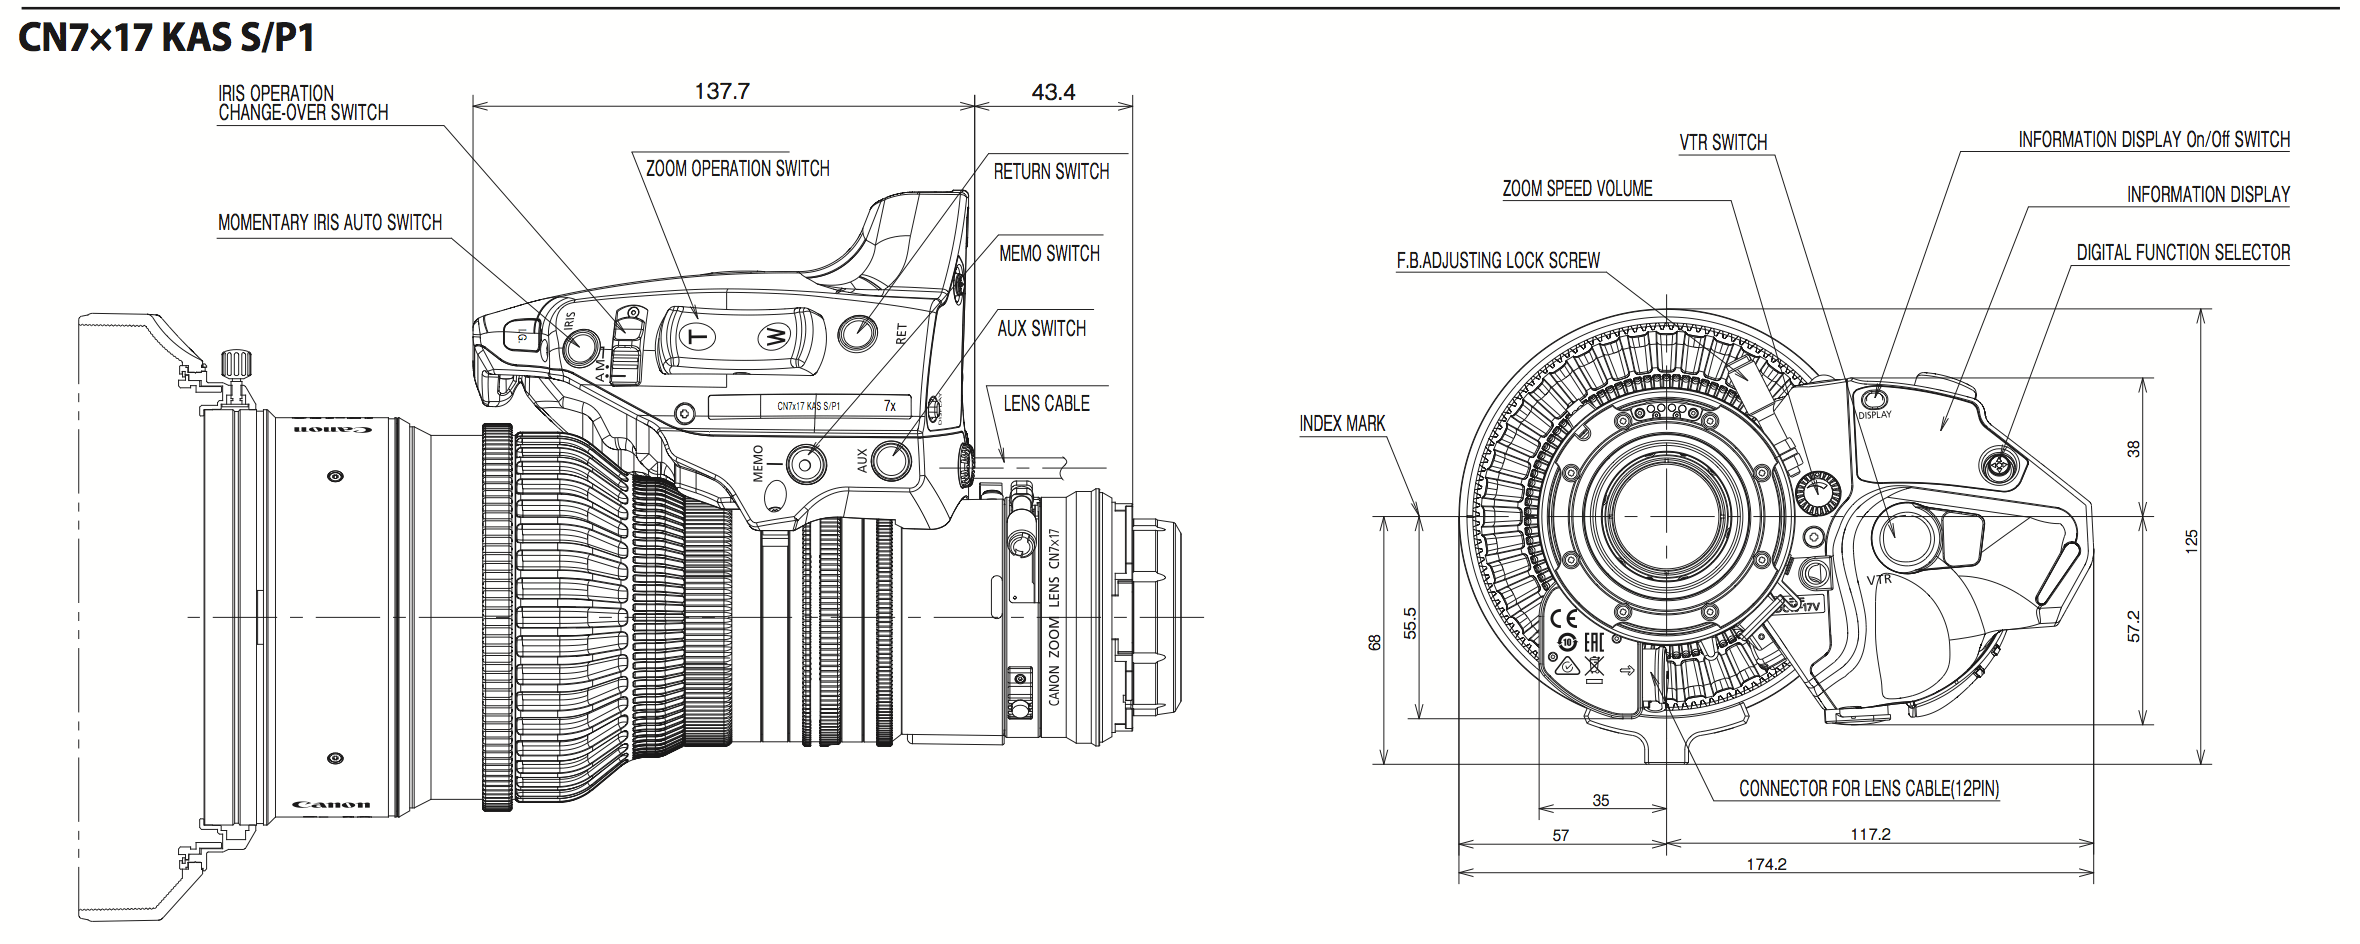 Canon Announces 17-120mm Cine Zoom Ahead of NAB